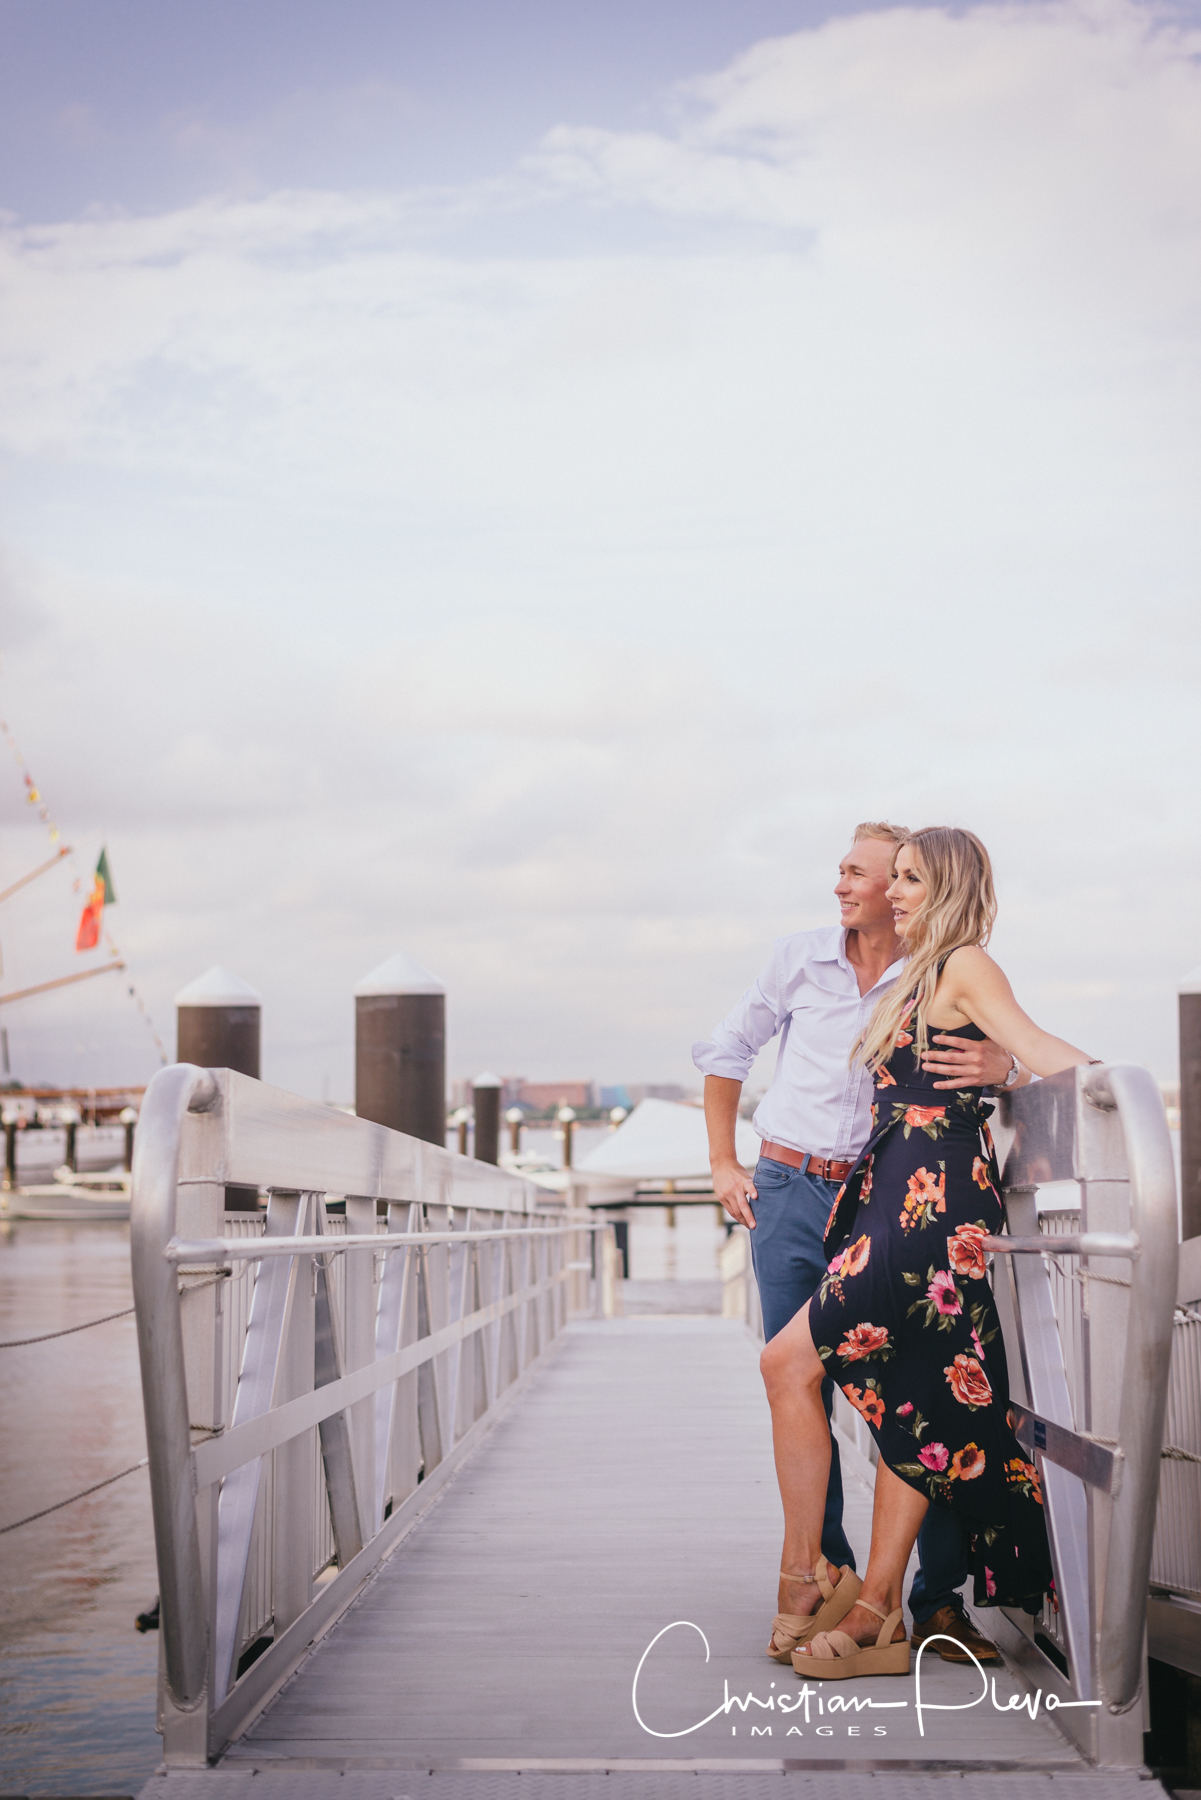 Boston Engagement Photography -8.jpg